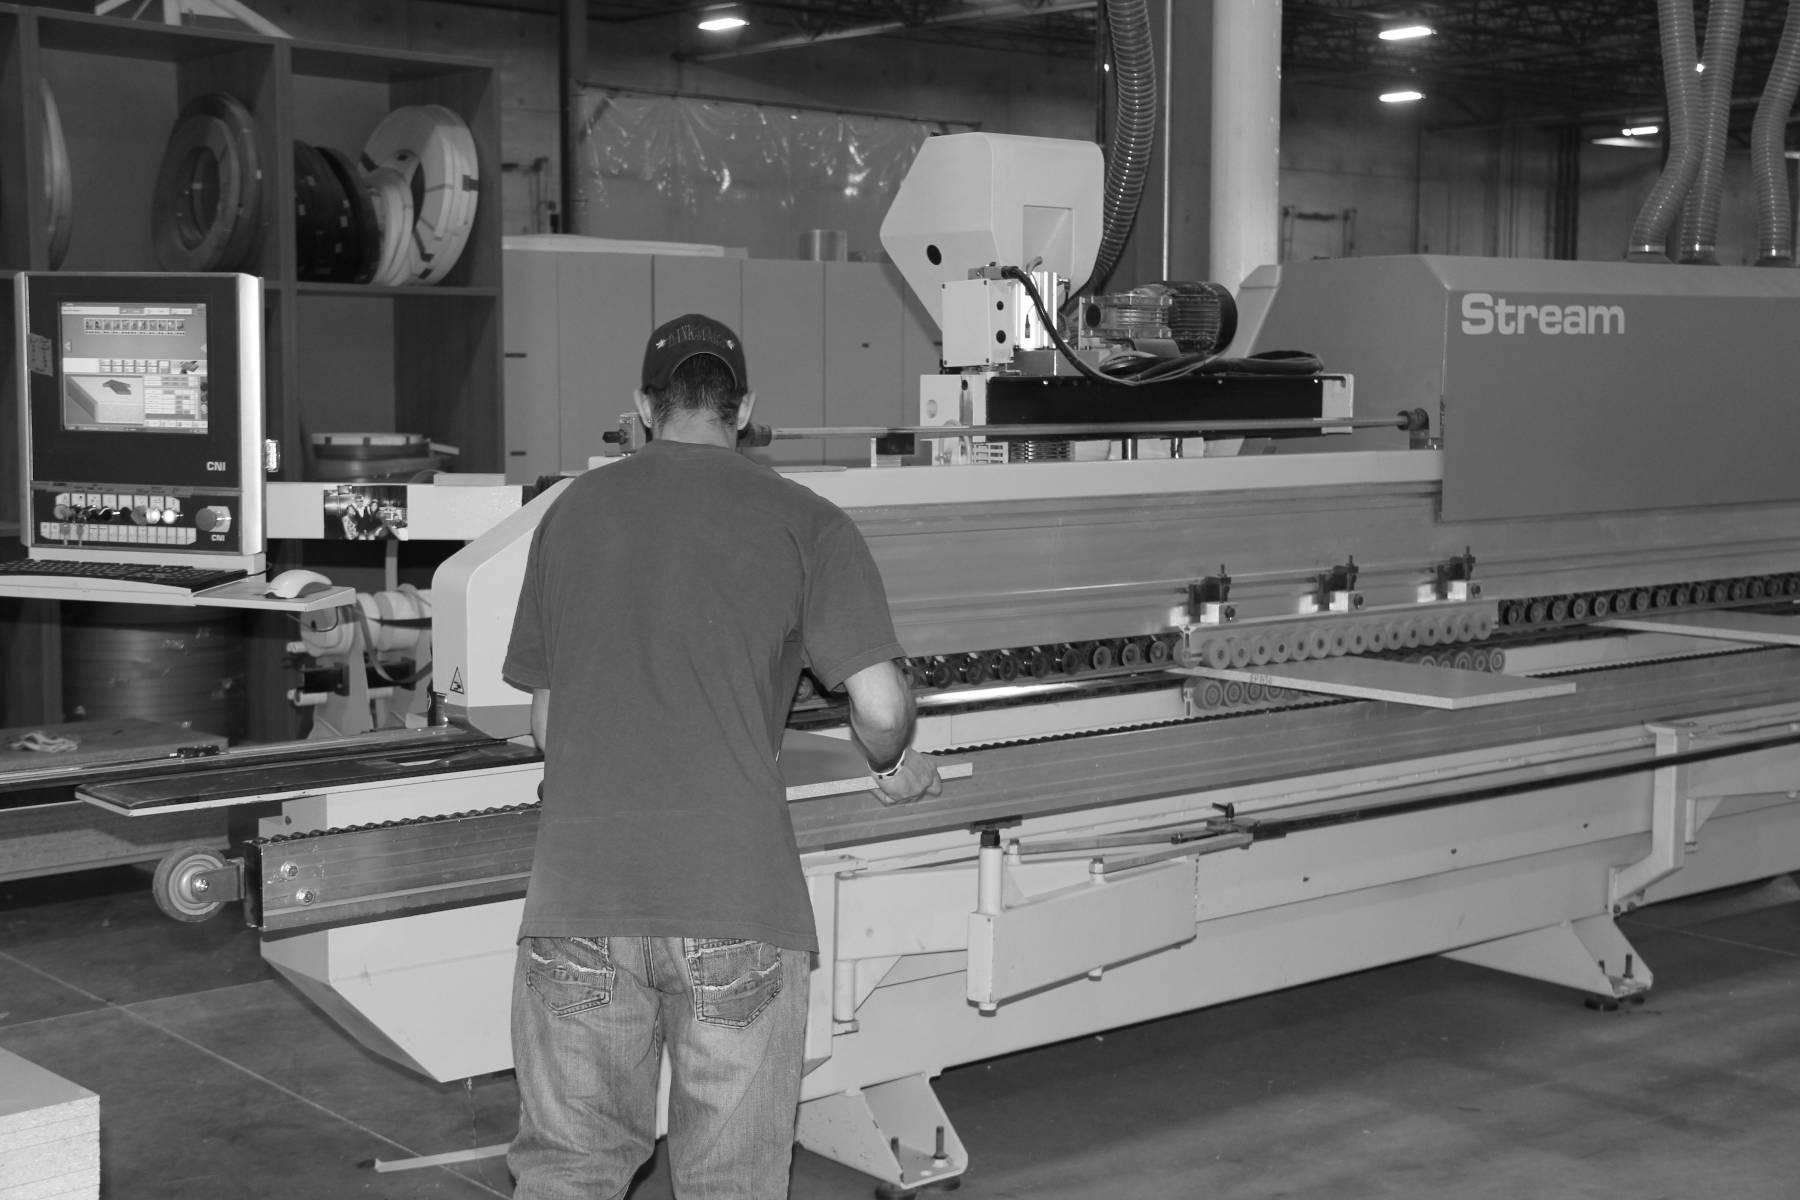 https://mw-sf.com/wp-content/uploads/2019/11/wood-manufacturing-05.jpg